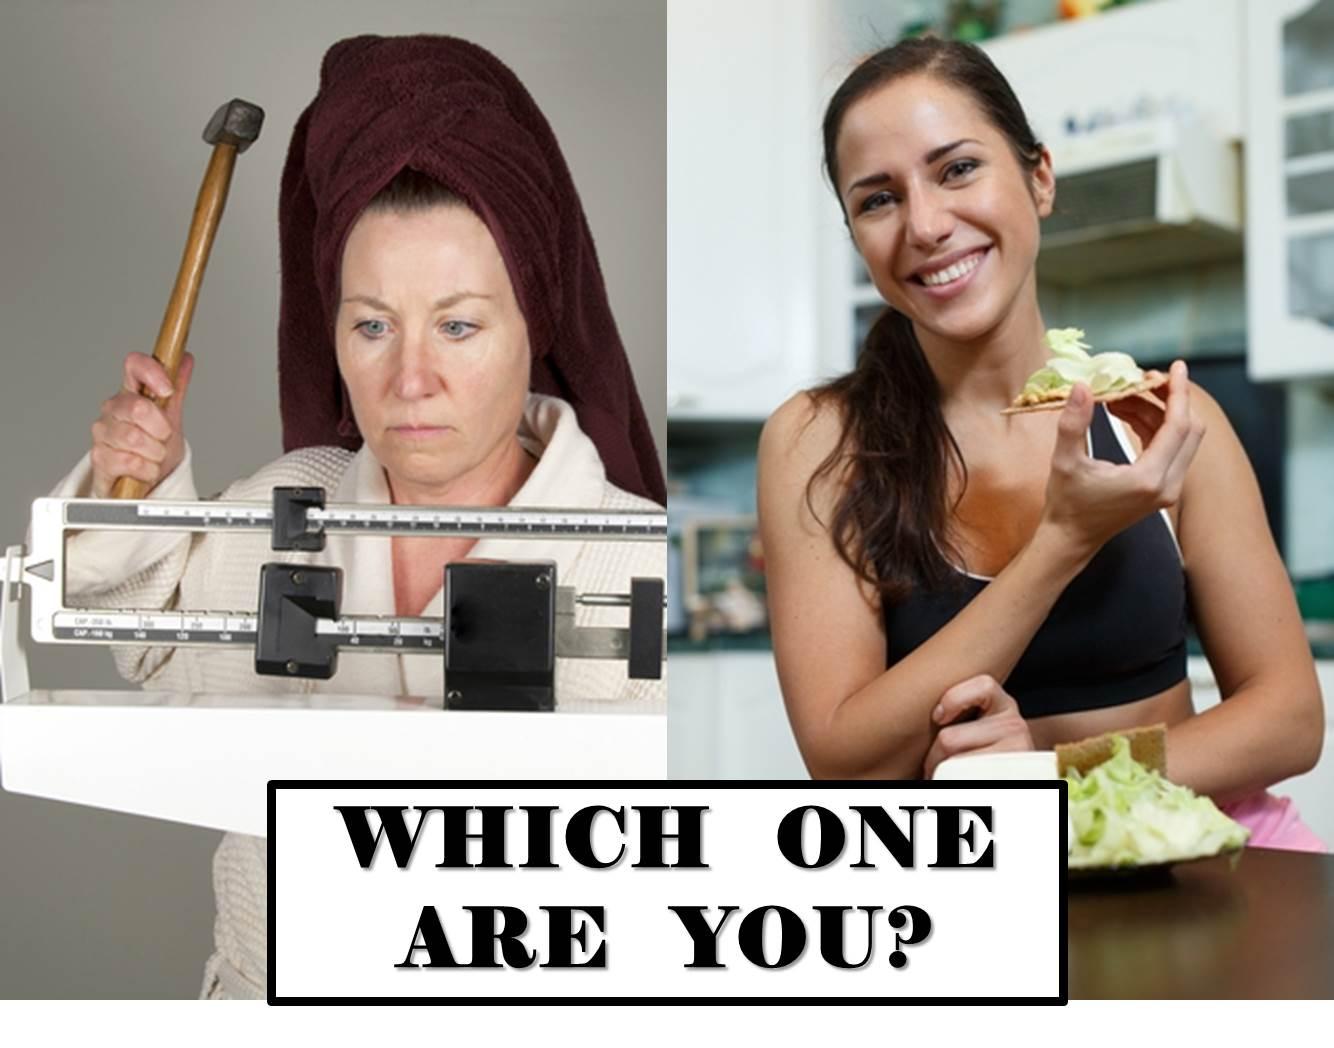 Diet vs. Fit-Minded